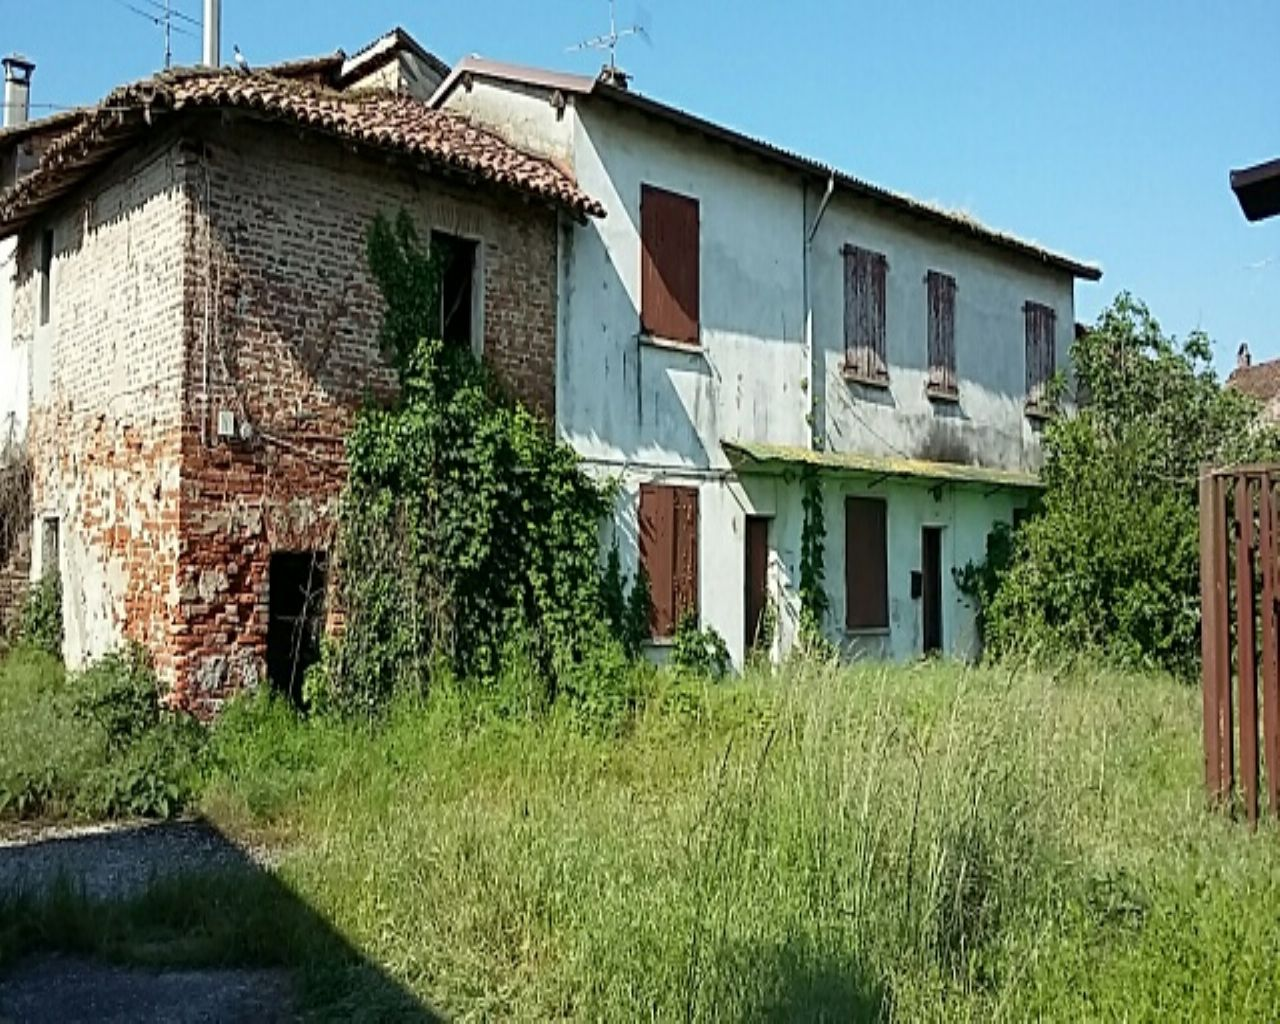 Rustico / Casale in vendita a Senna Lodigiana, 8 locali, Trattative riservate | Cambio Casa.it